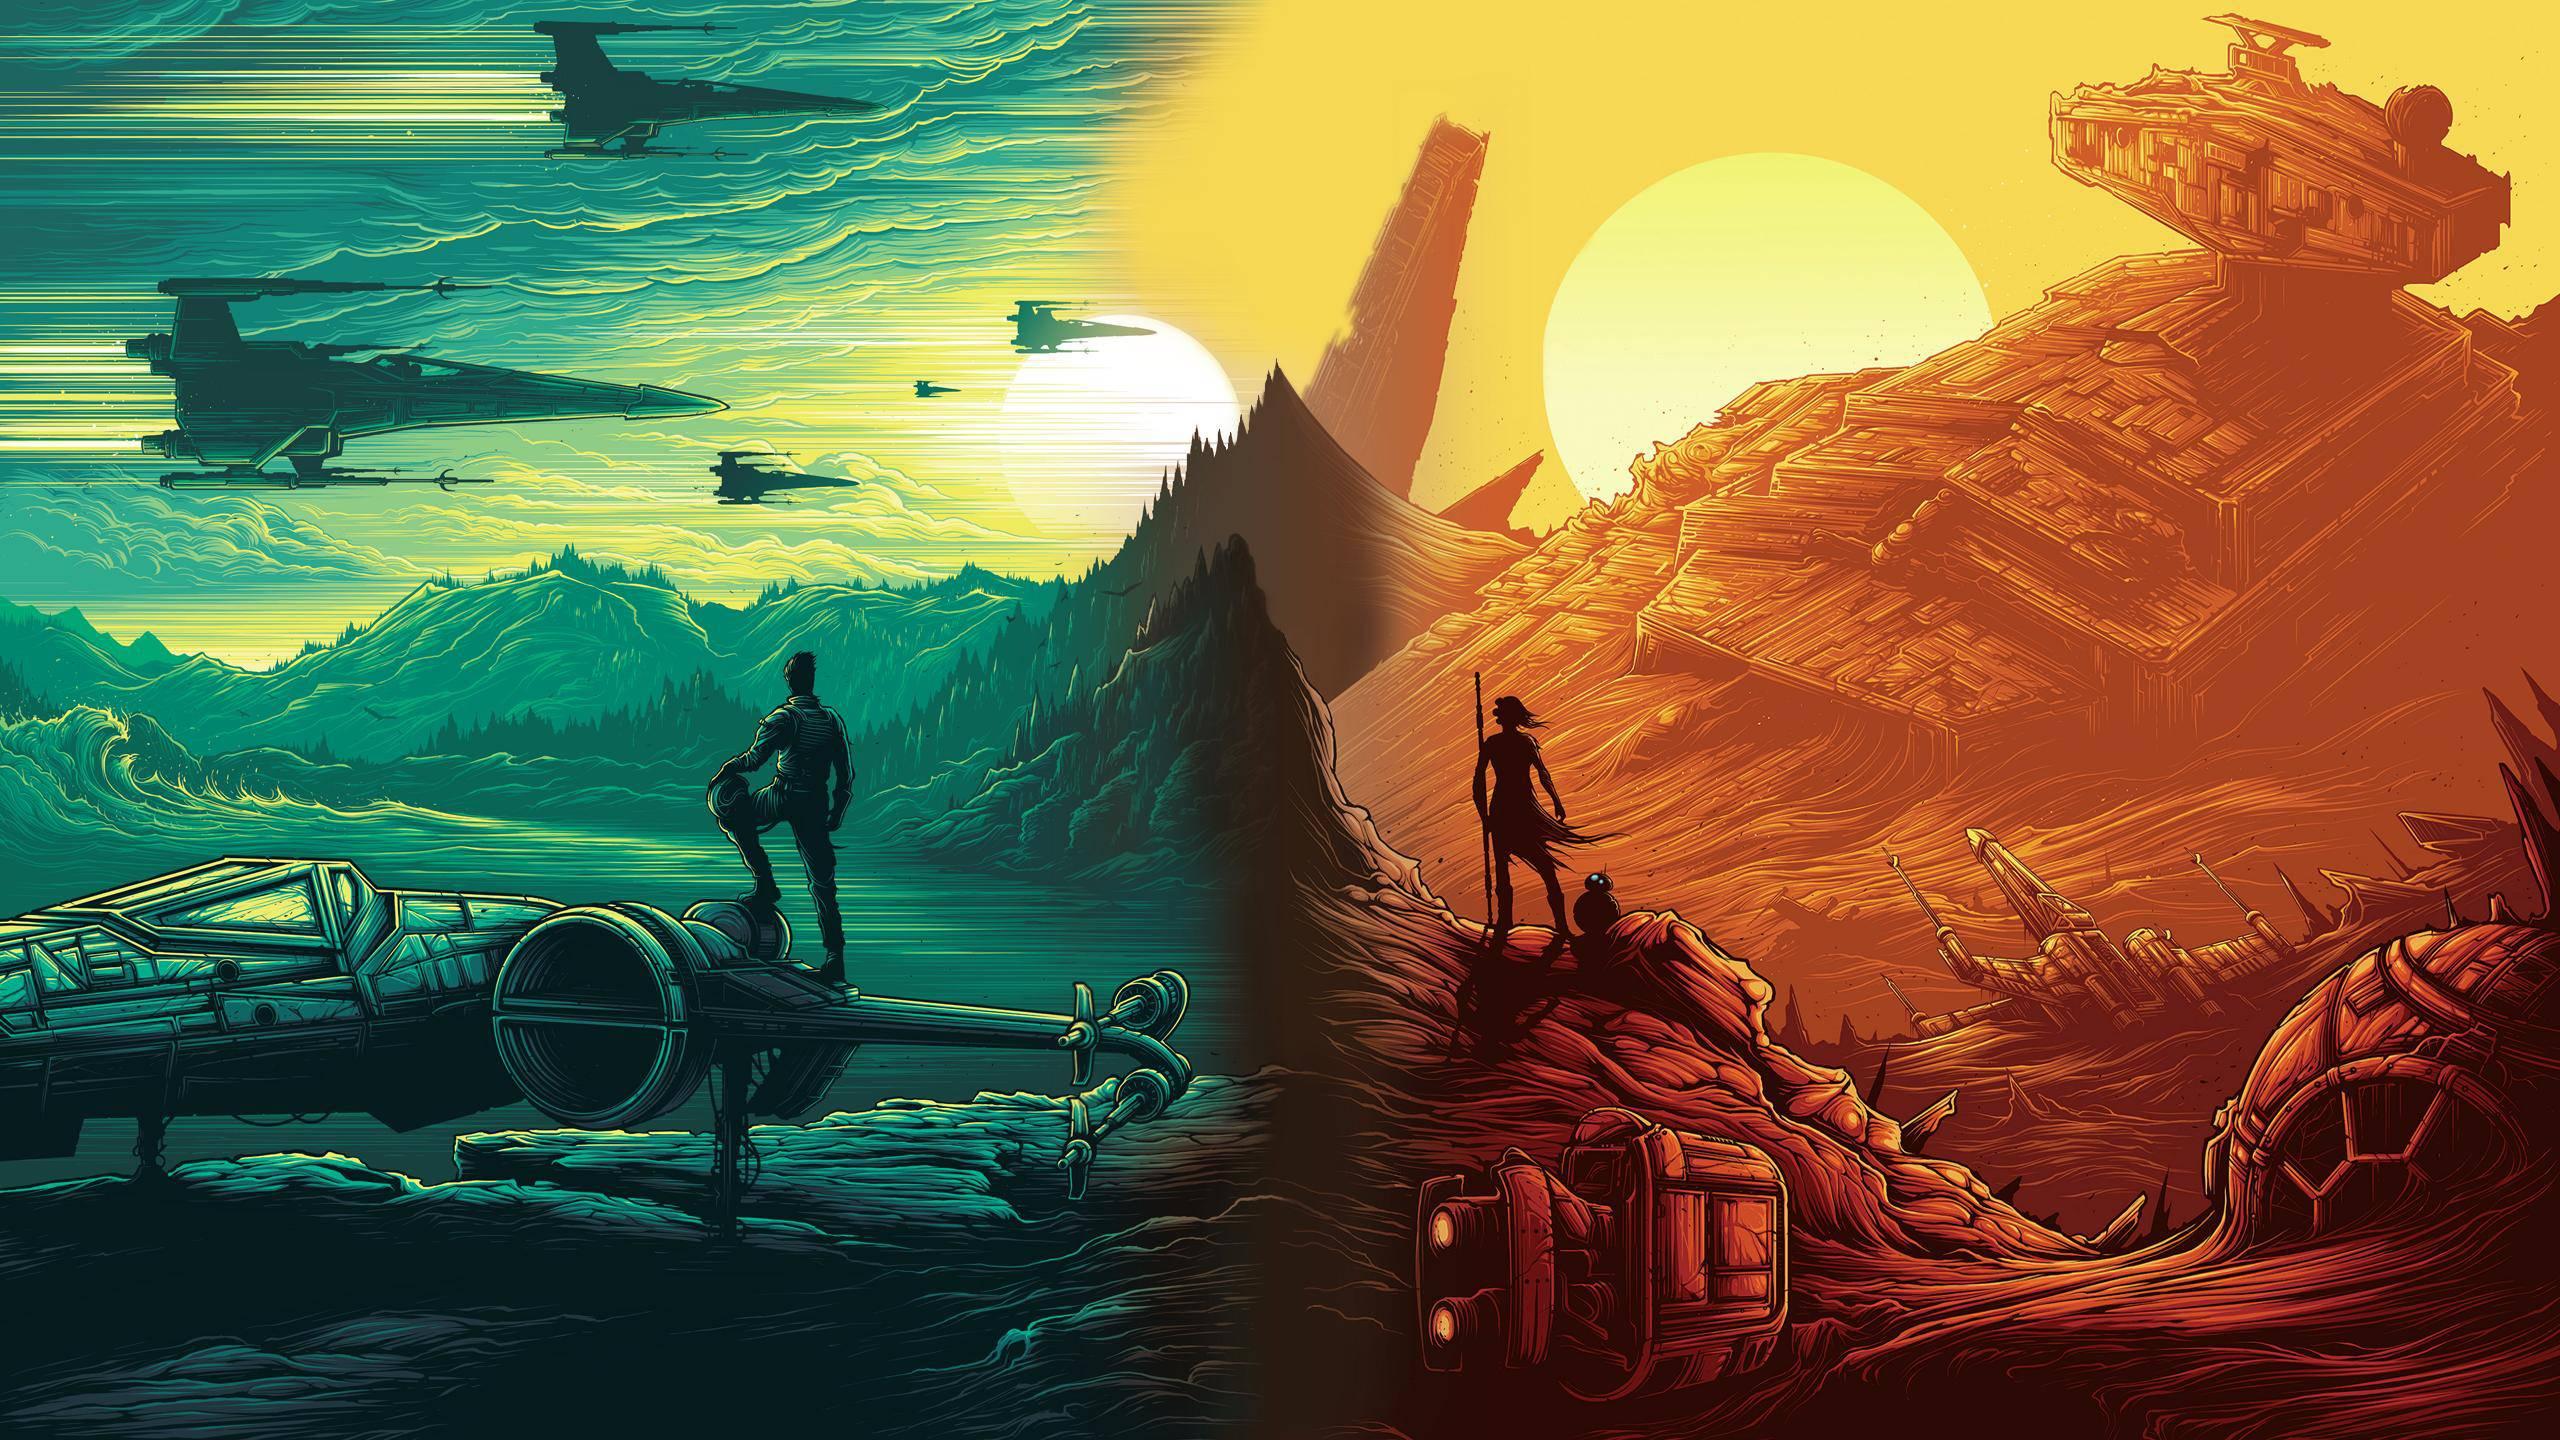 Free Download Star Wars The Force Awakens Amc One Sheet 24